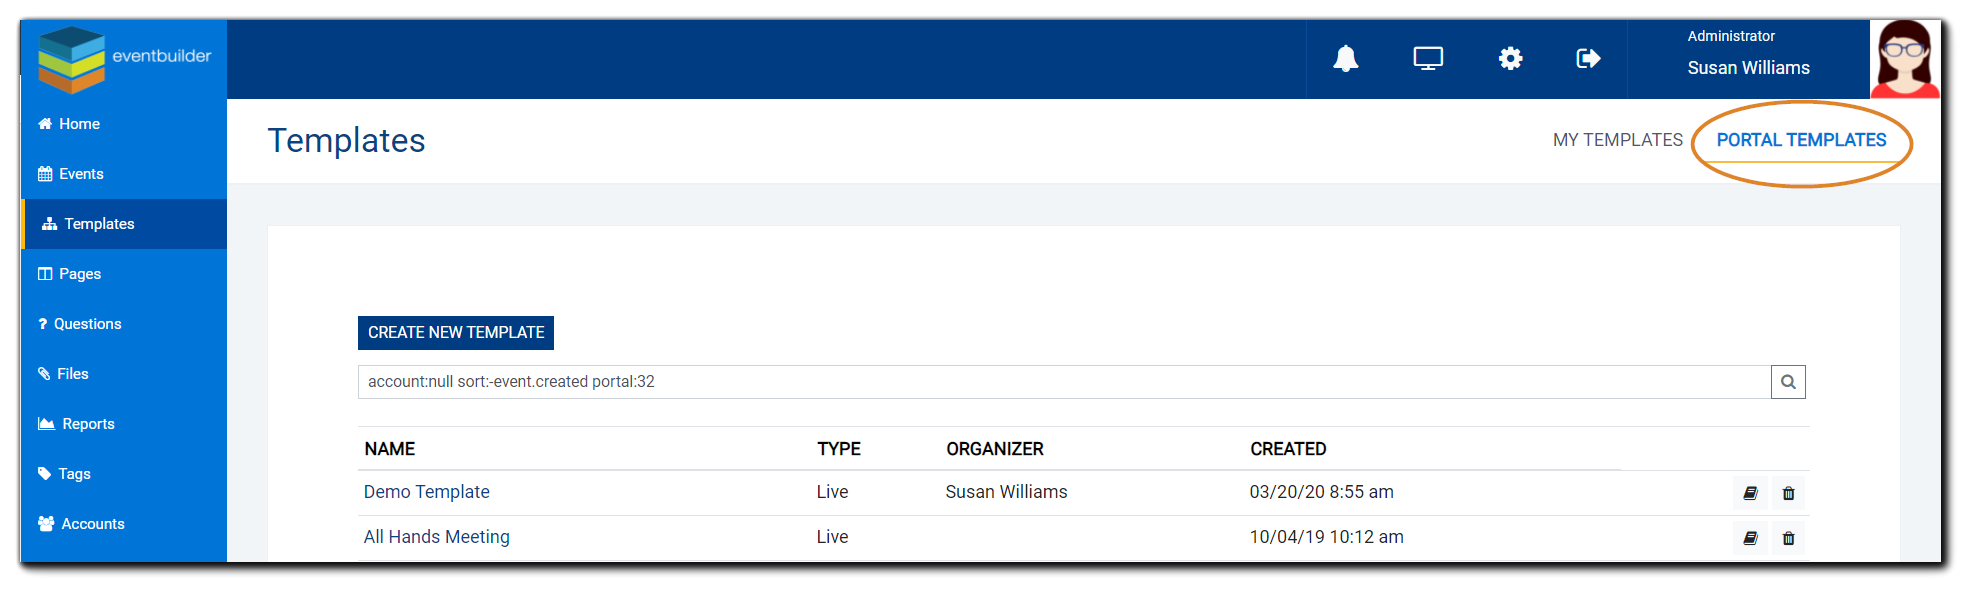 "Screenshot: Portal Templates list, upper right label ""Portal Templates"" highlighted."